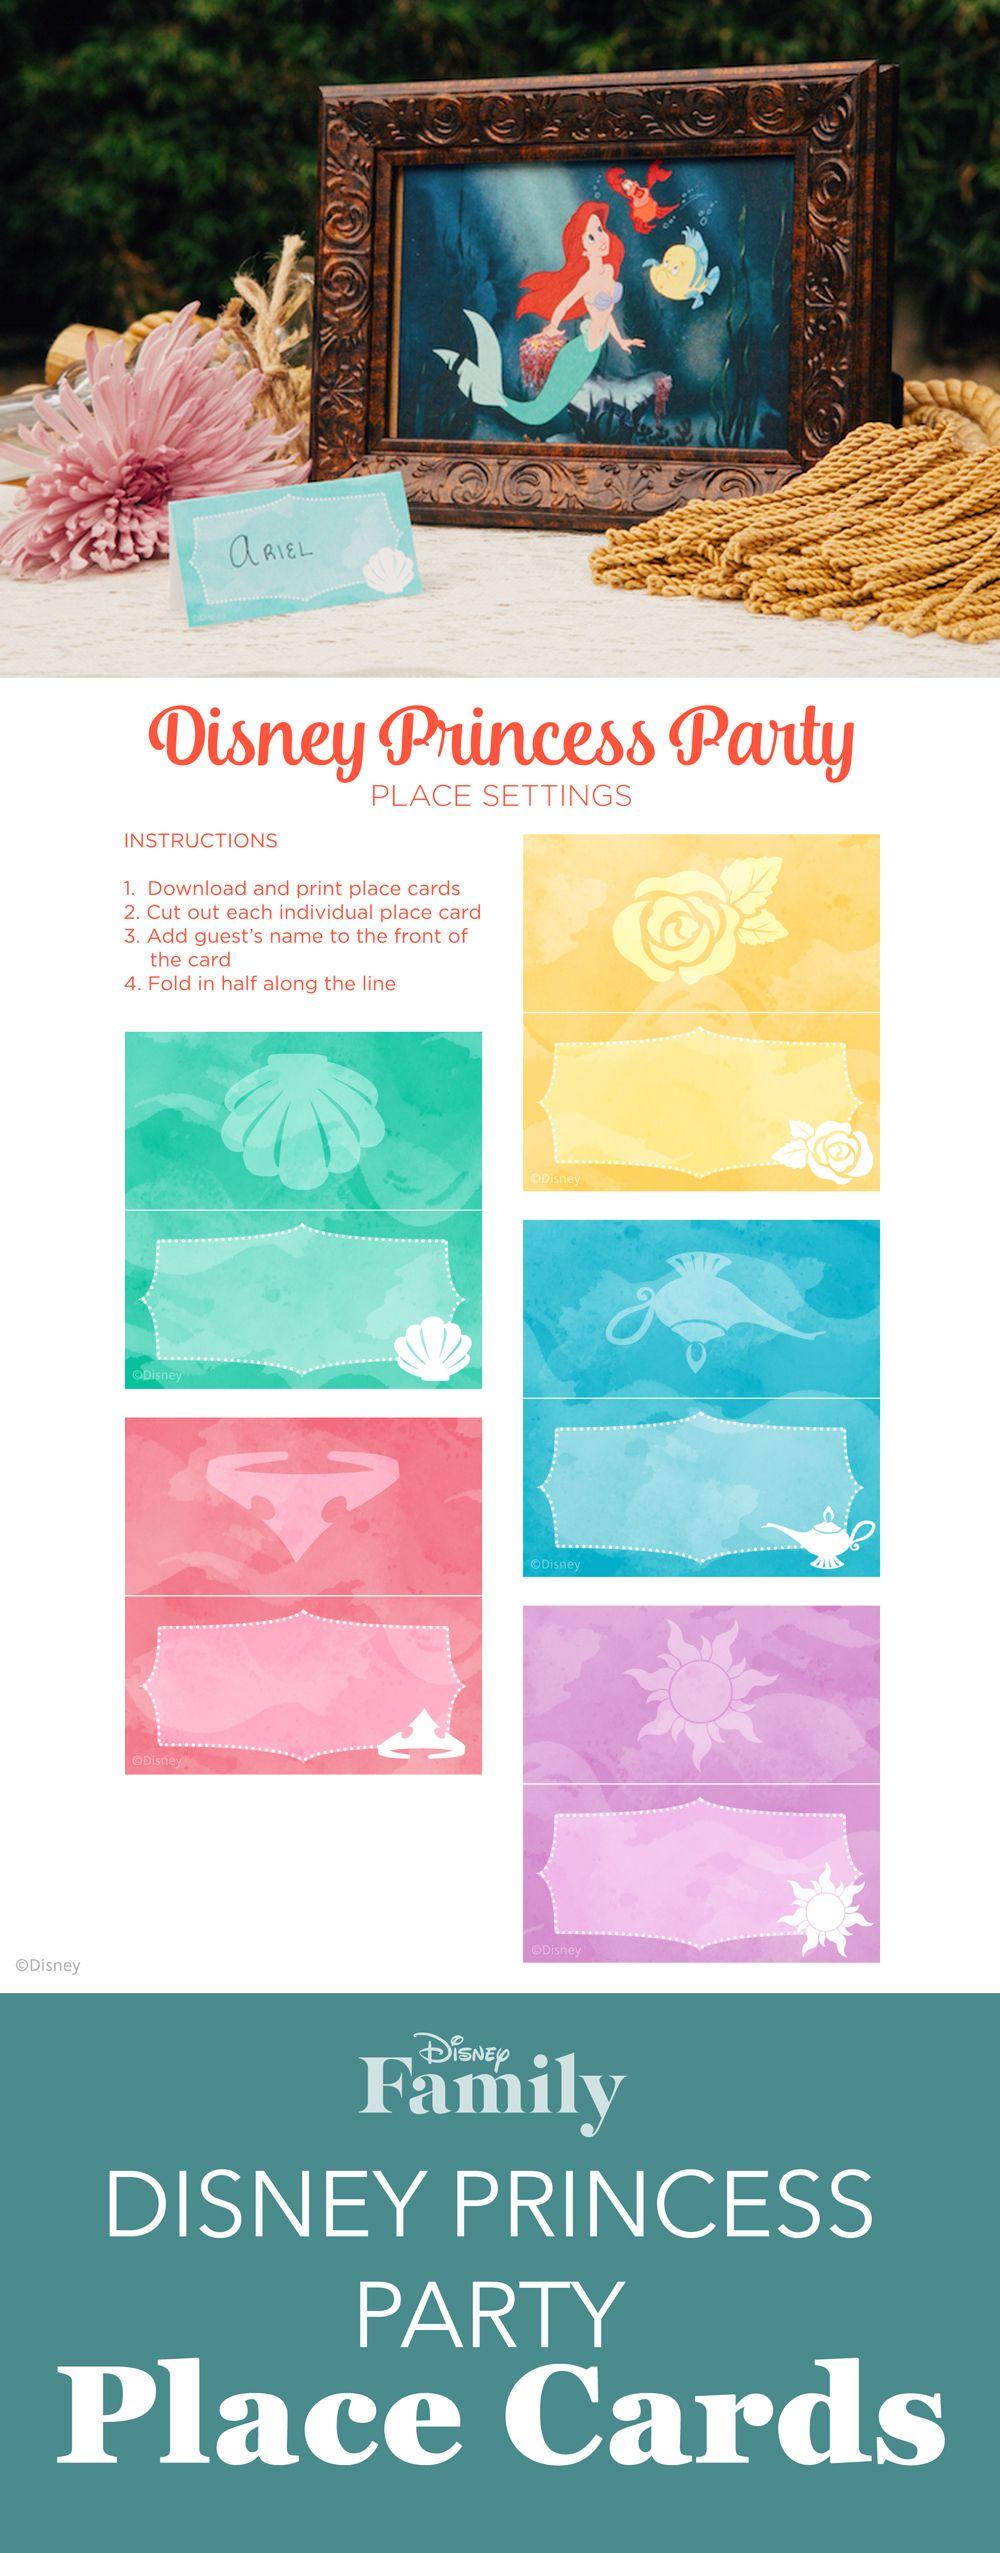 Disney Princess Party Place Cards Party Ideas Disney